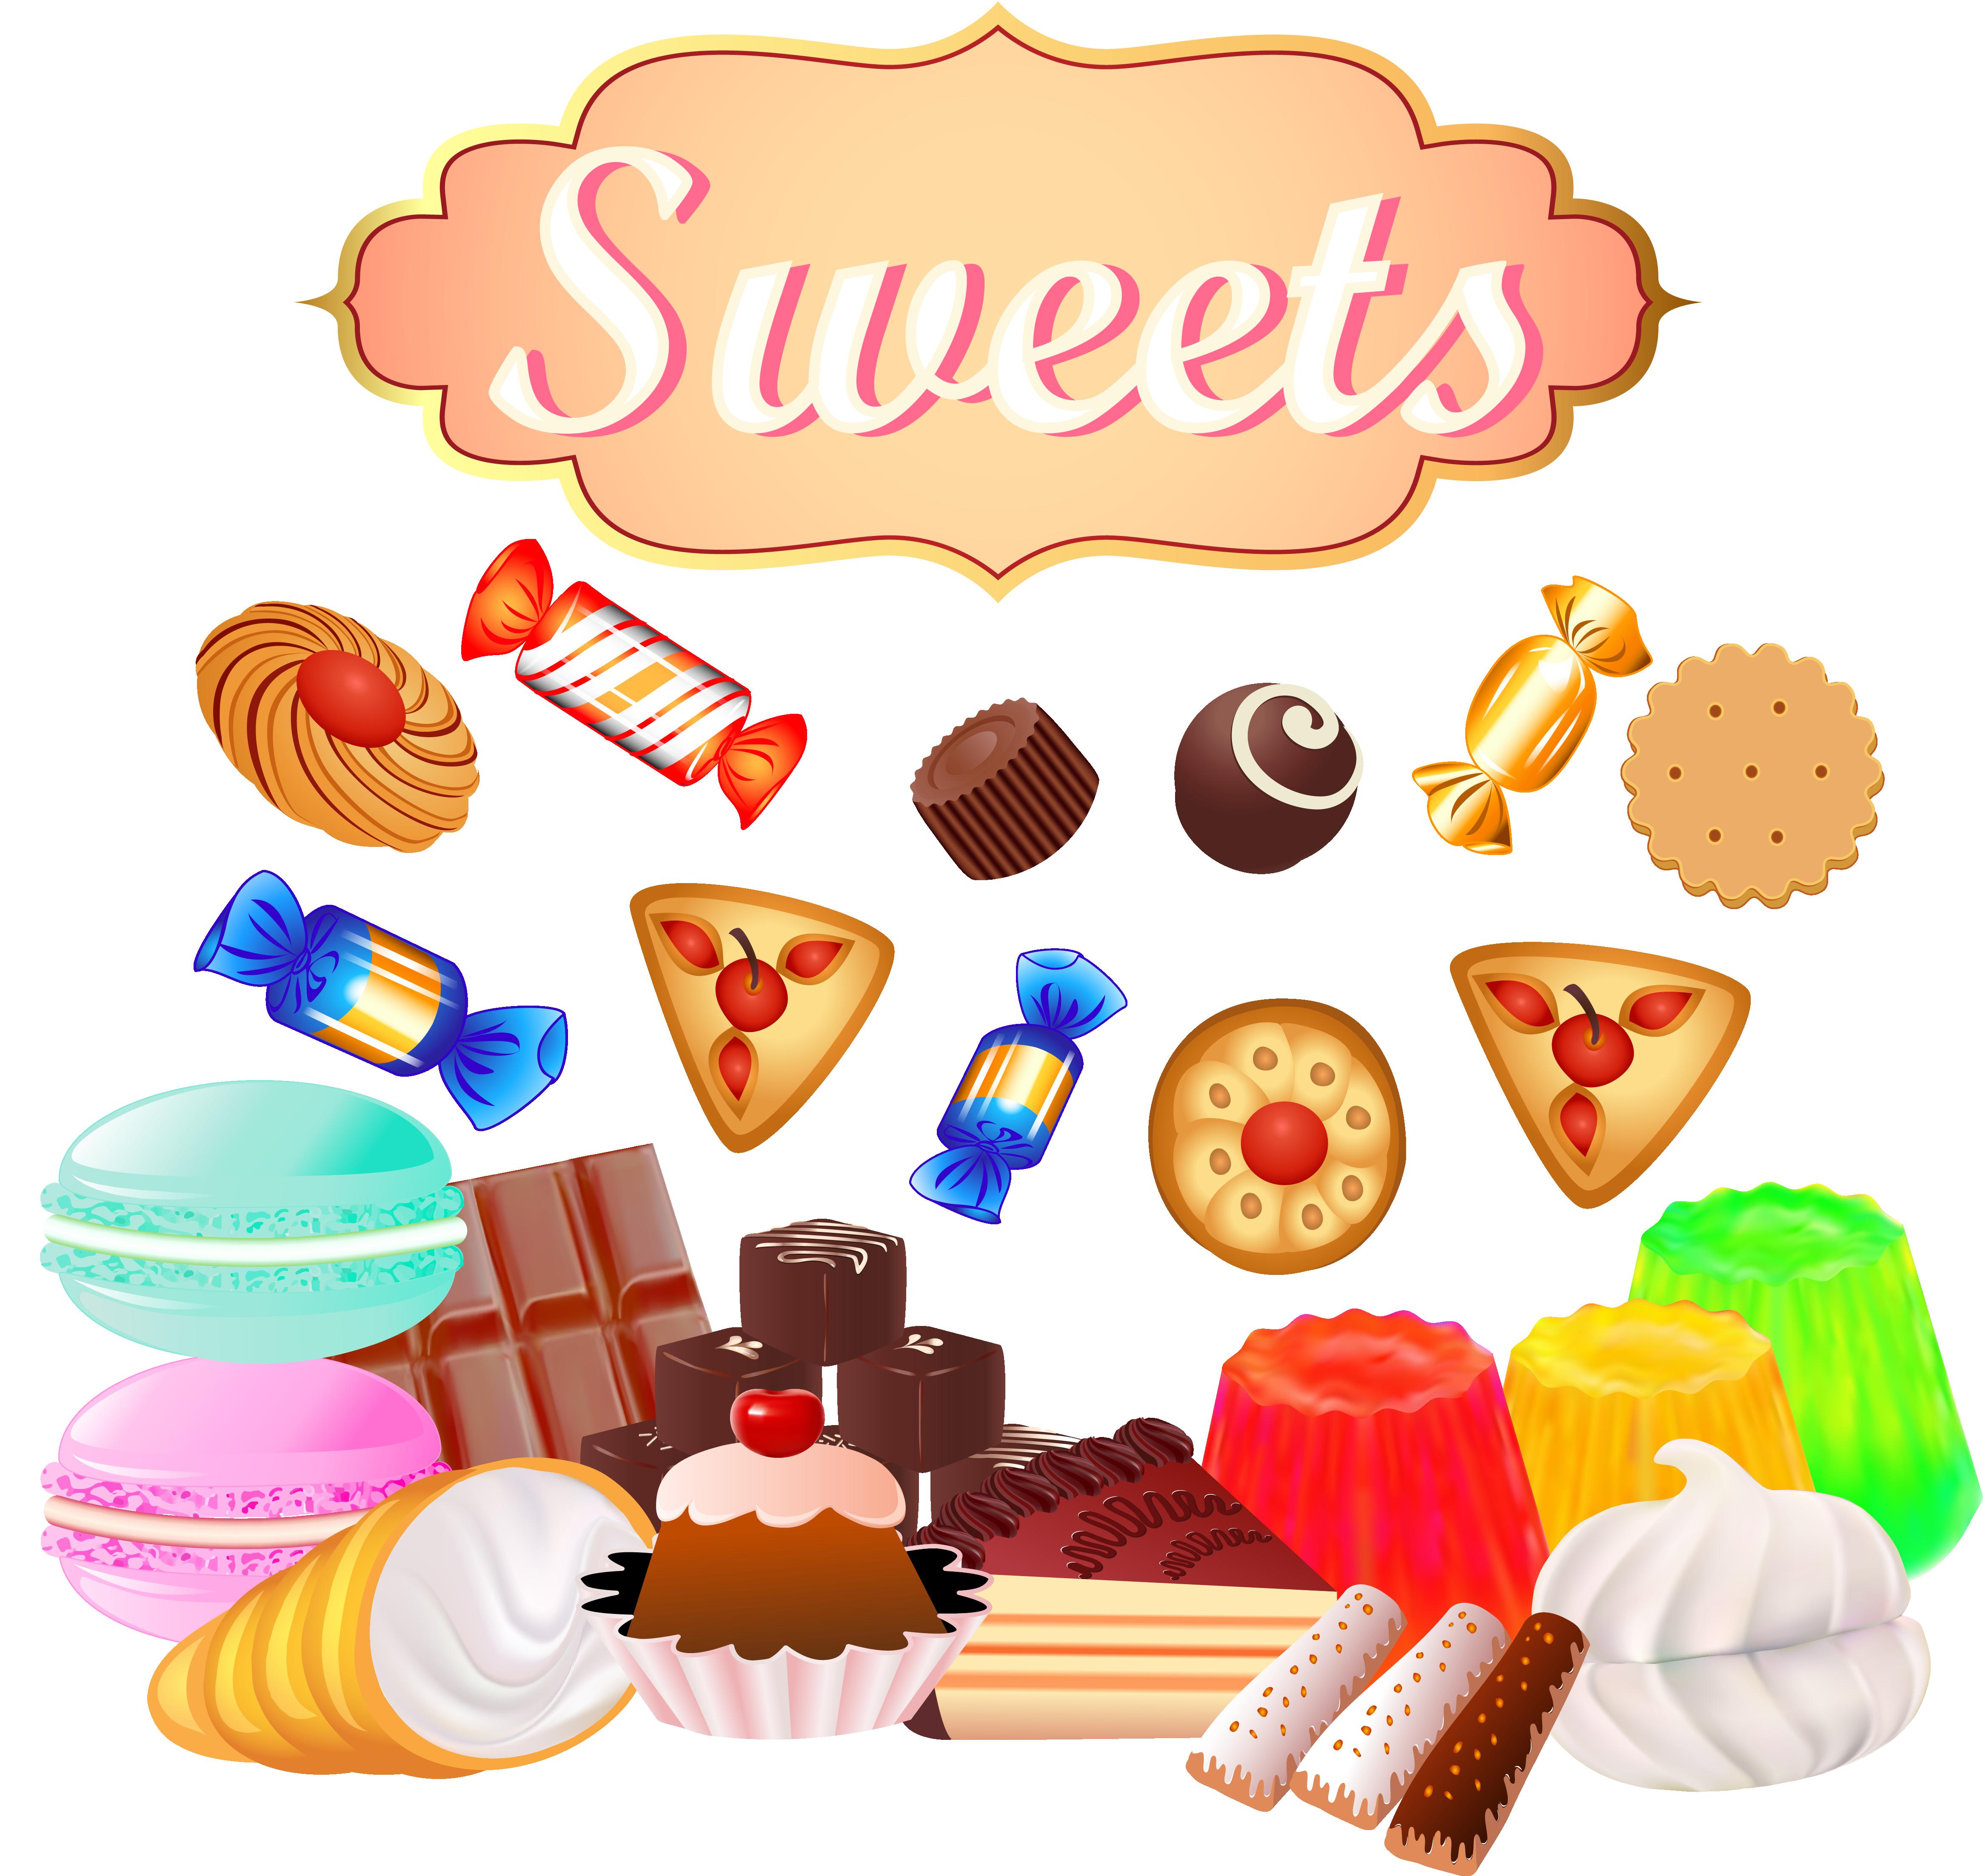 Doughnut cupcake lollipop chocolate. Clipart candy junk food